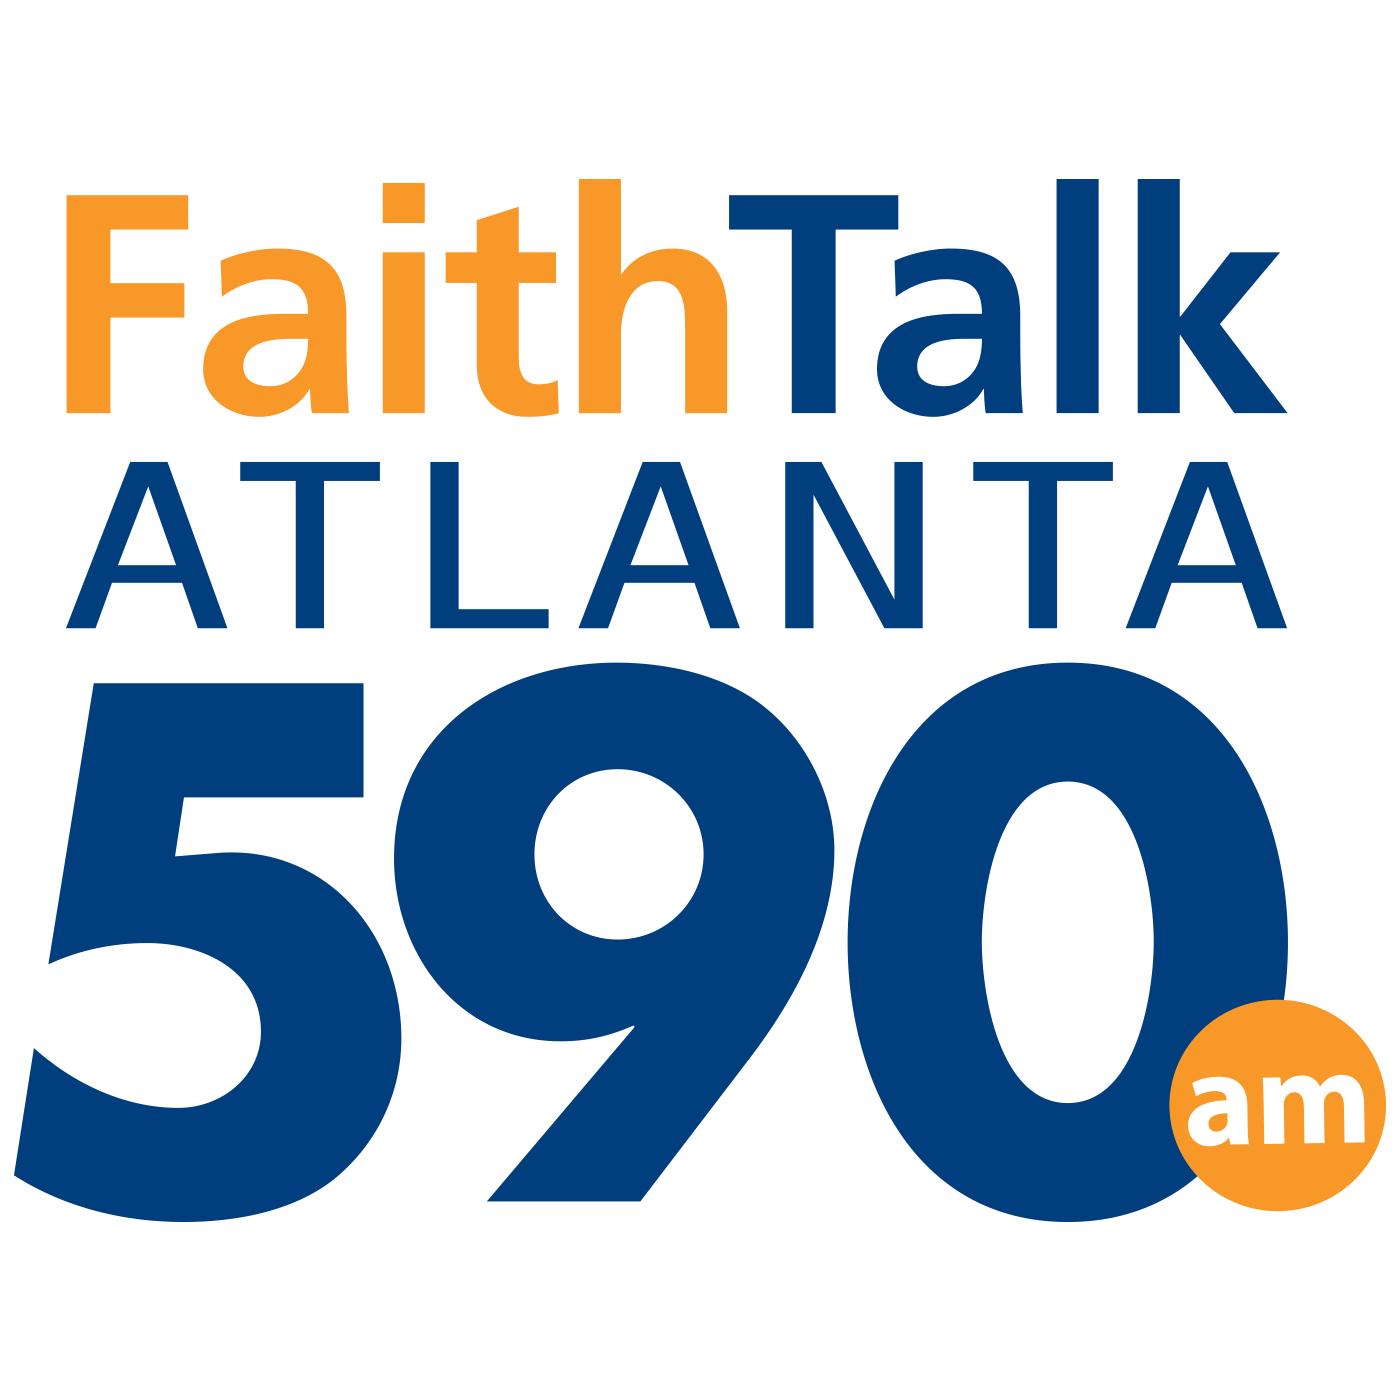 FaithTalk Atlanta 590